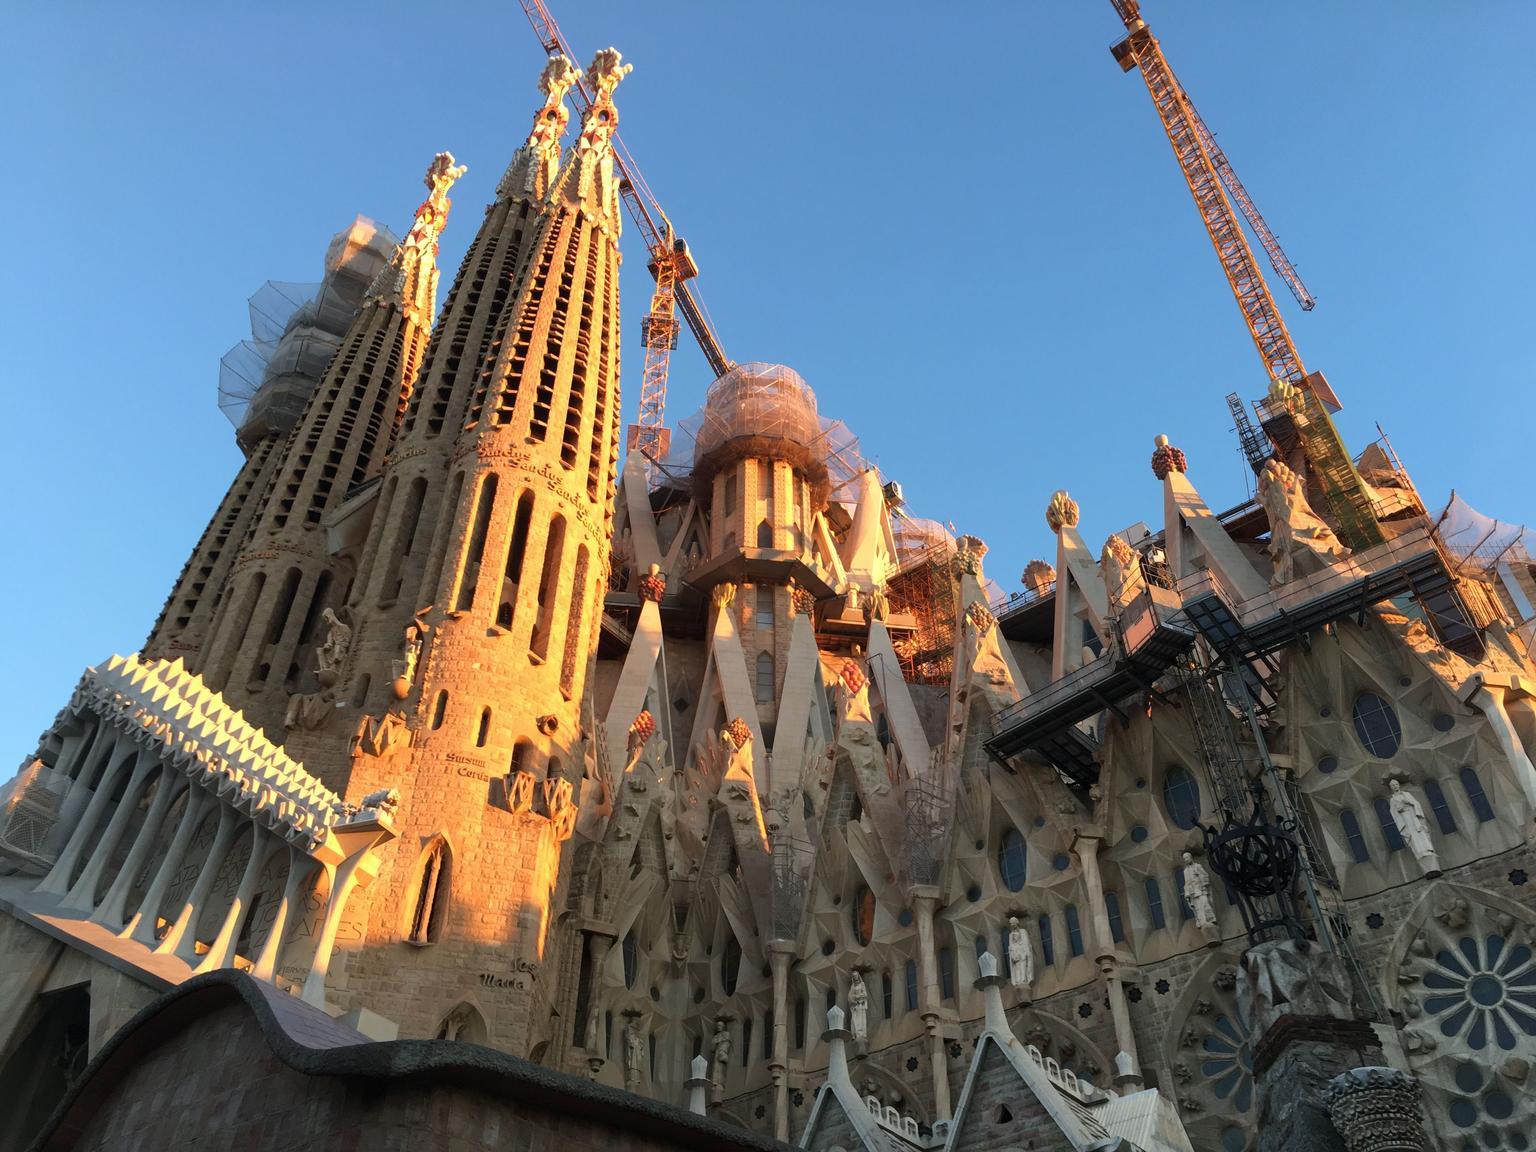 MORE PHOTOS, Skip the Line: Park Guell and La Sagrada Familia Guided Tour